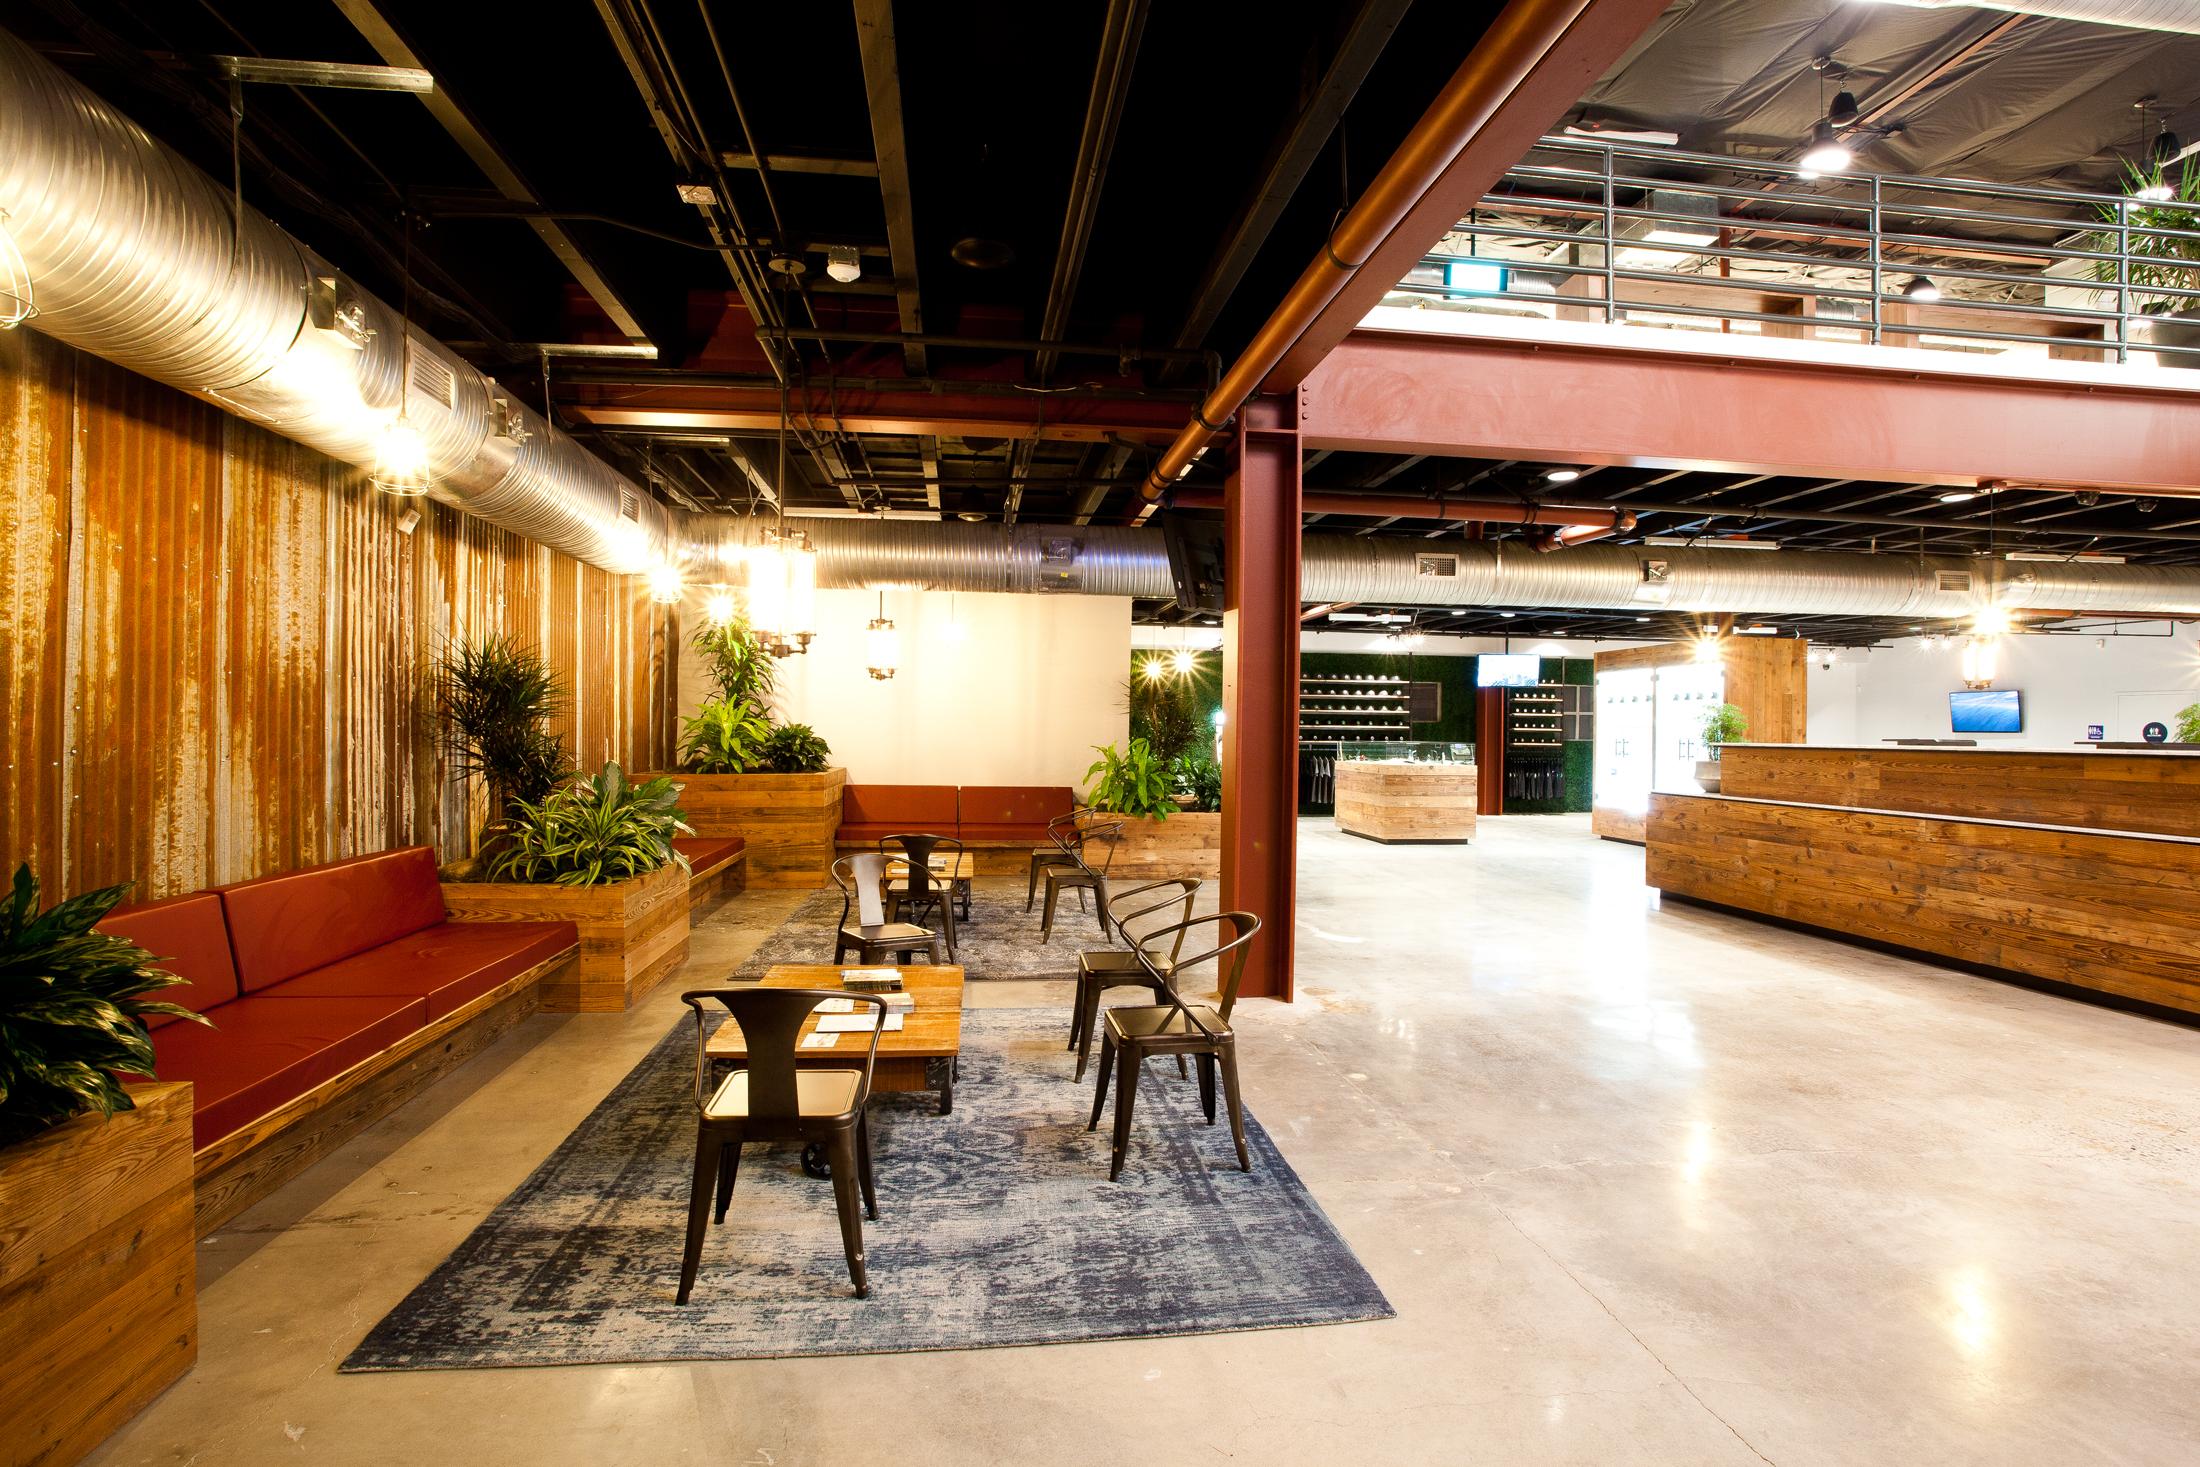 lounge_area_small.jpg